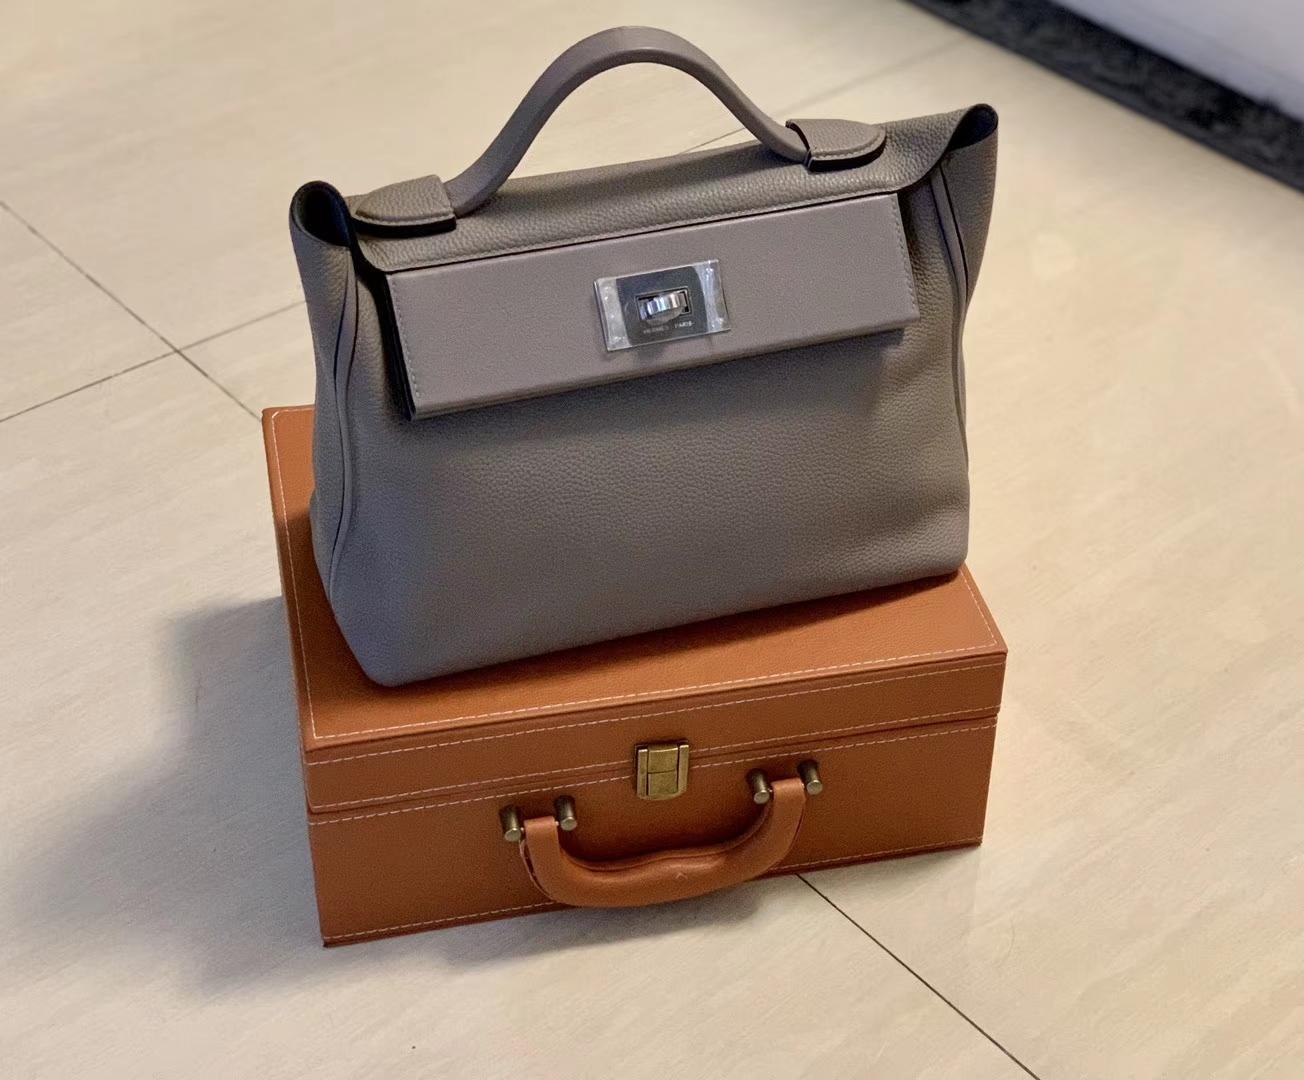 Hermès(爱马仕)Kelly-2424 斑鸠灰 原厂御用顶级小牛皮拼Swift皮 togo 银扣 29cm